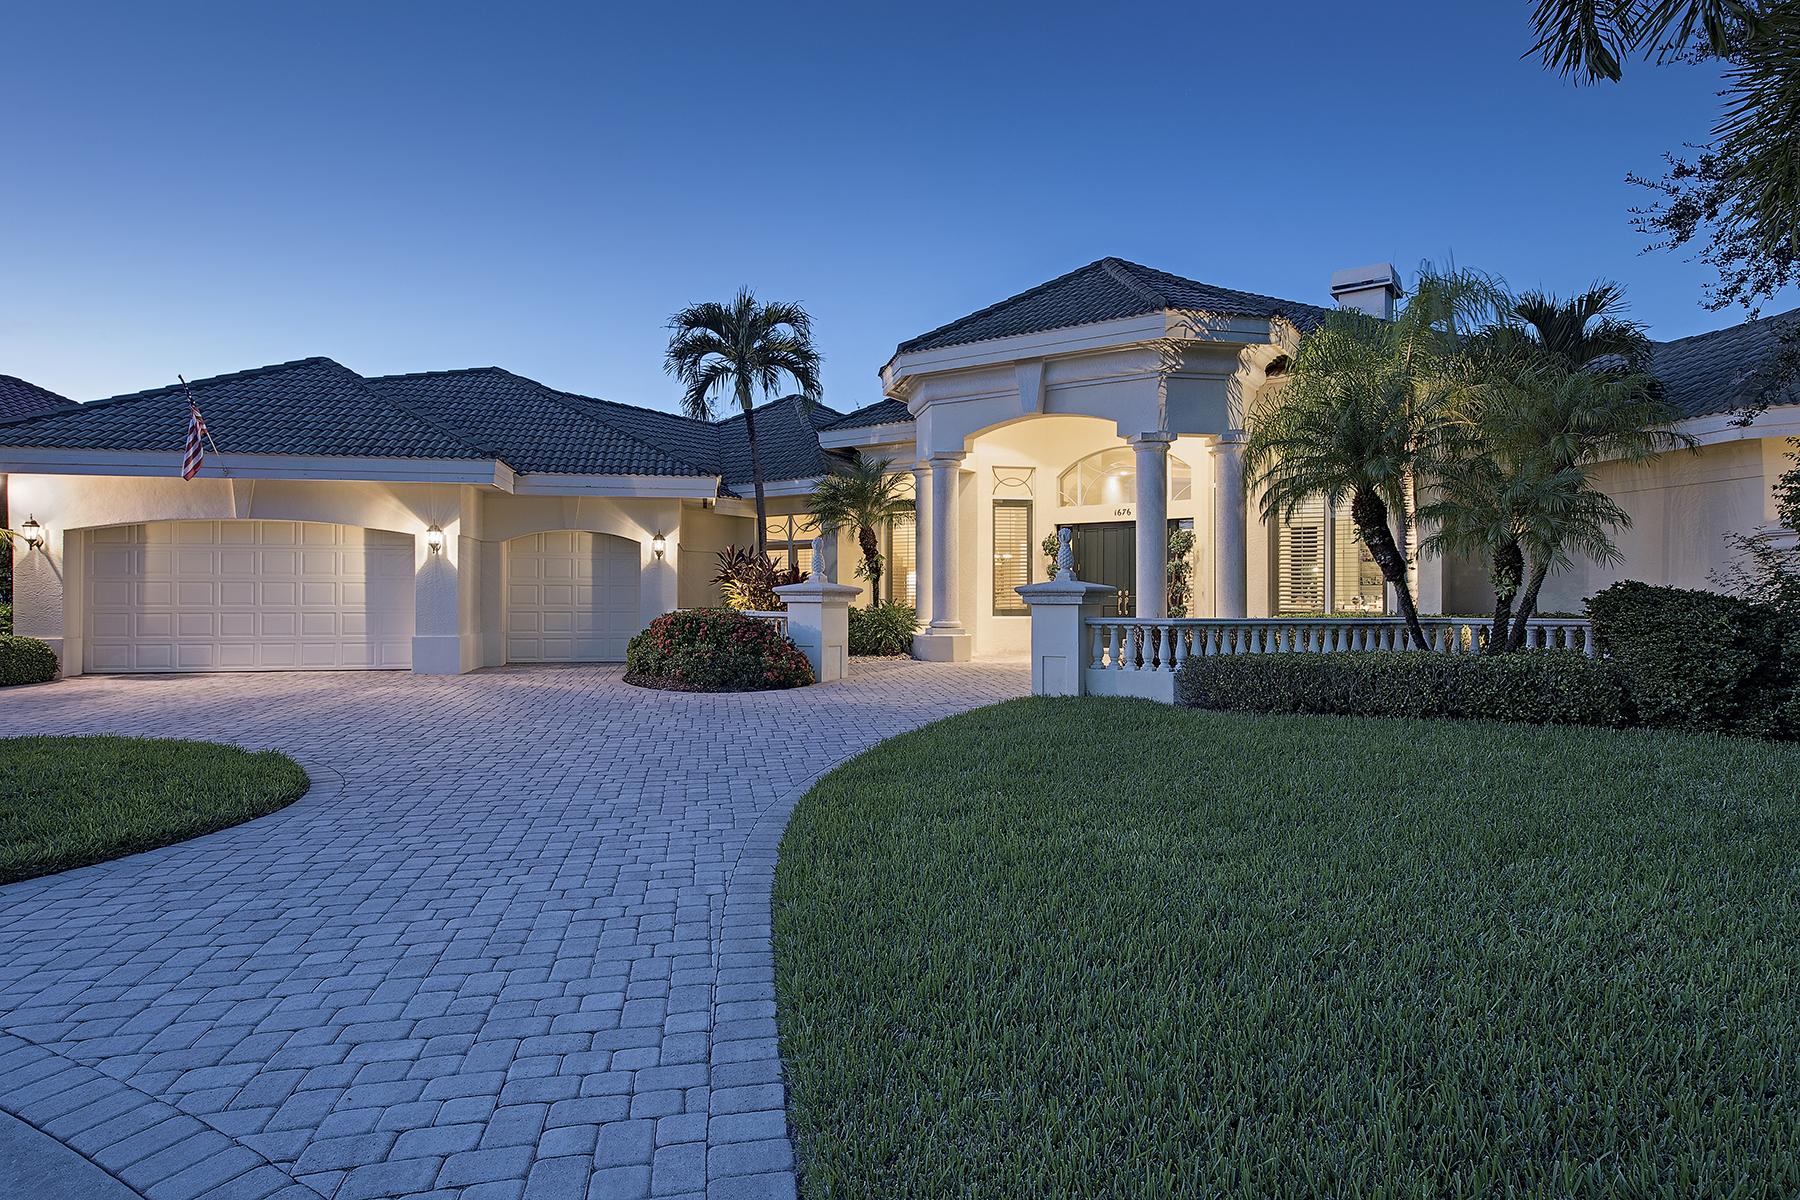 獨棟家庭住宅 為 出售 在 PELICAN MARSH - MARSH LINKS 1676 Persimmon Dr Naples, 佛羅里達州 34109 美國